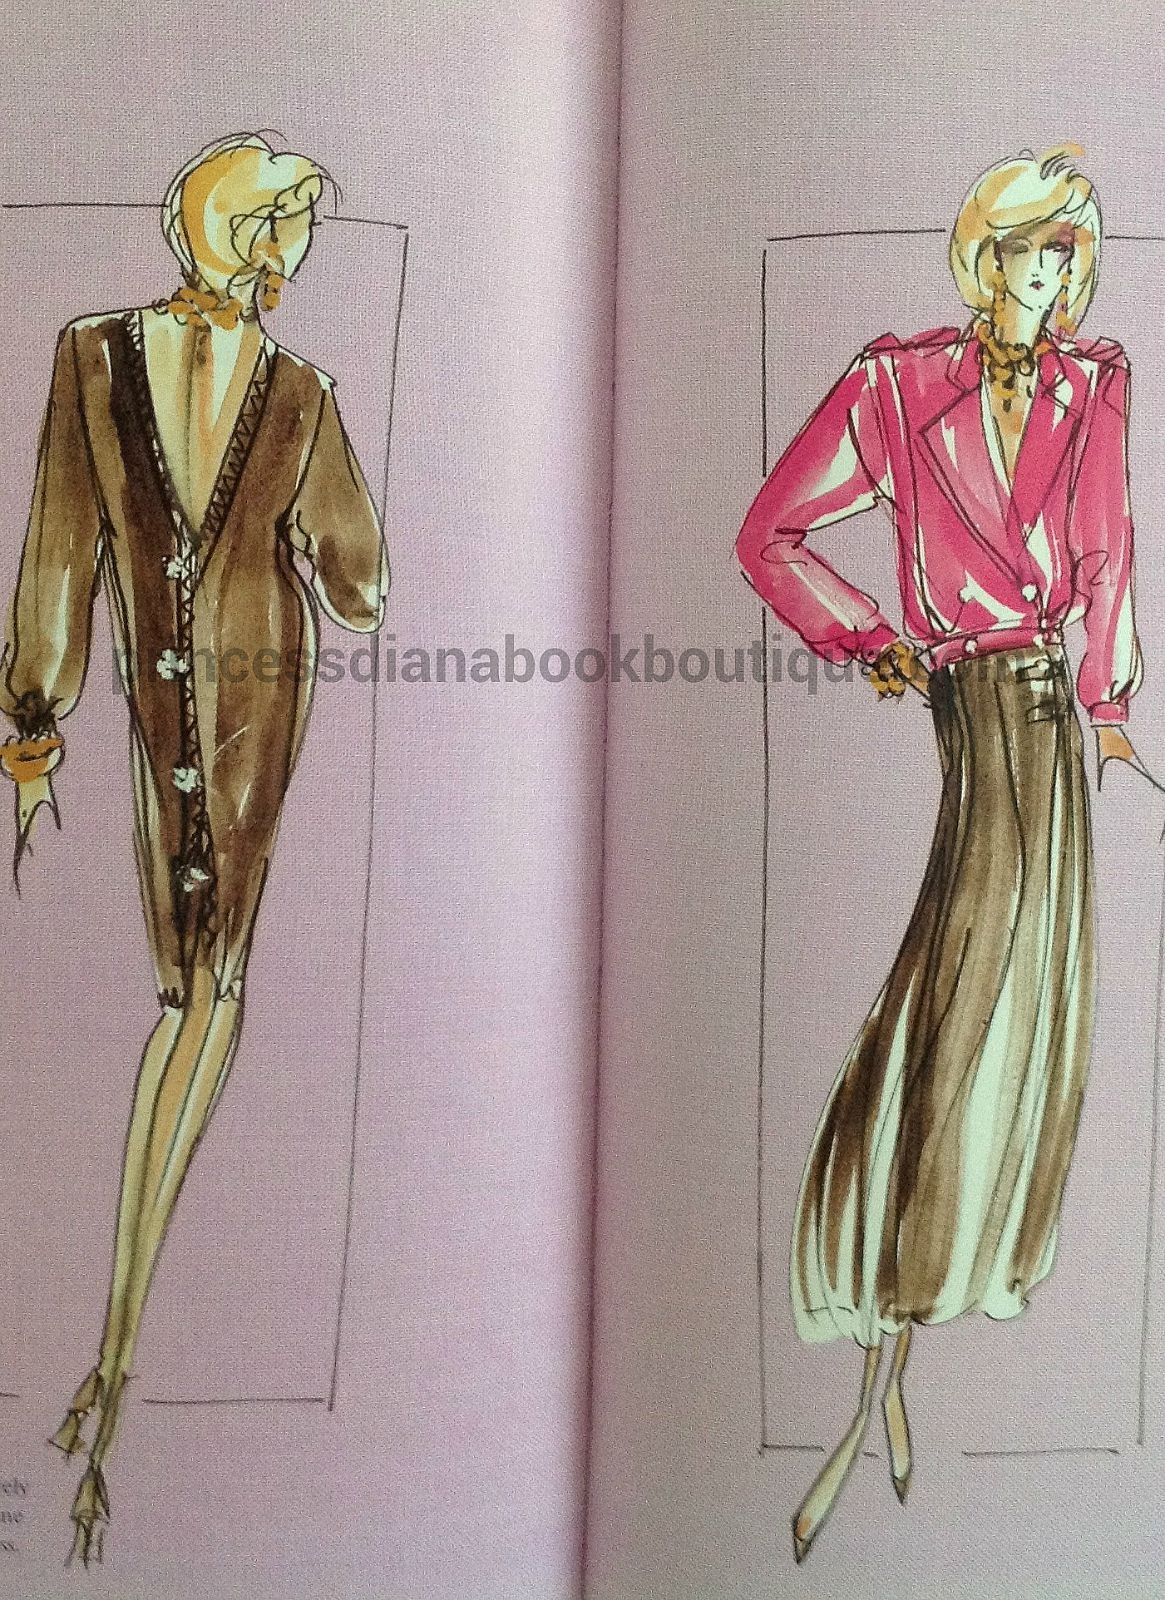 March 2 2015 Princess Diana News Blog All Things Princess Diana